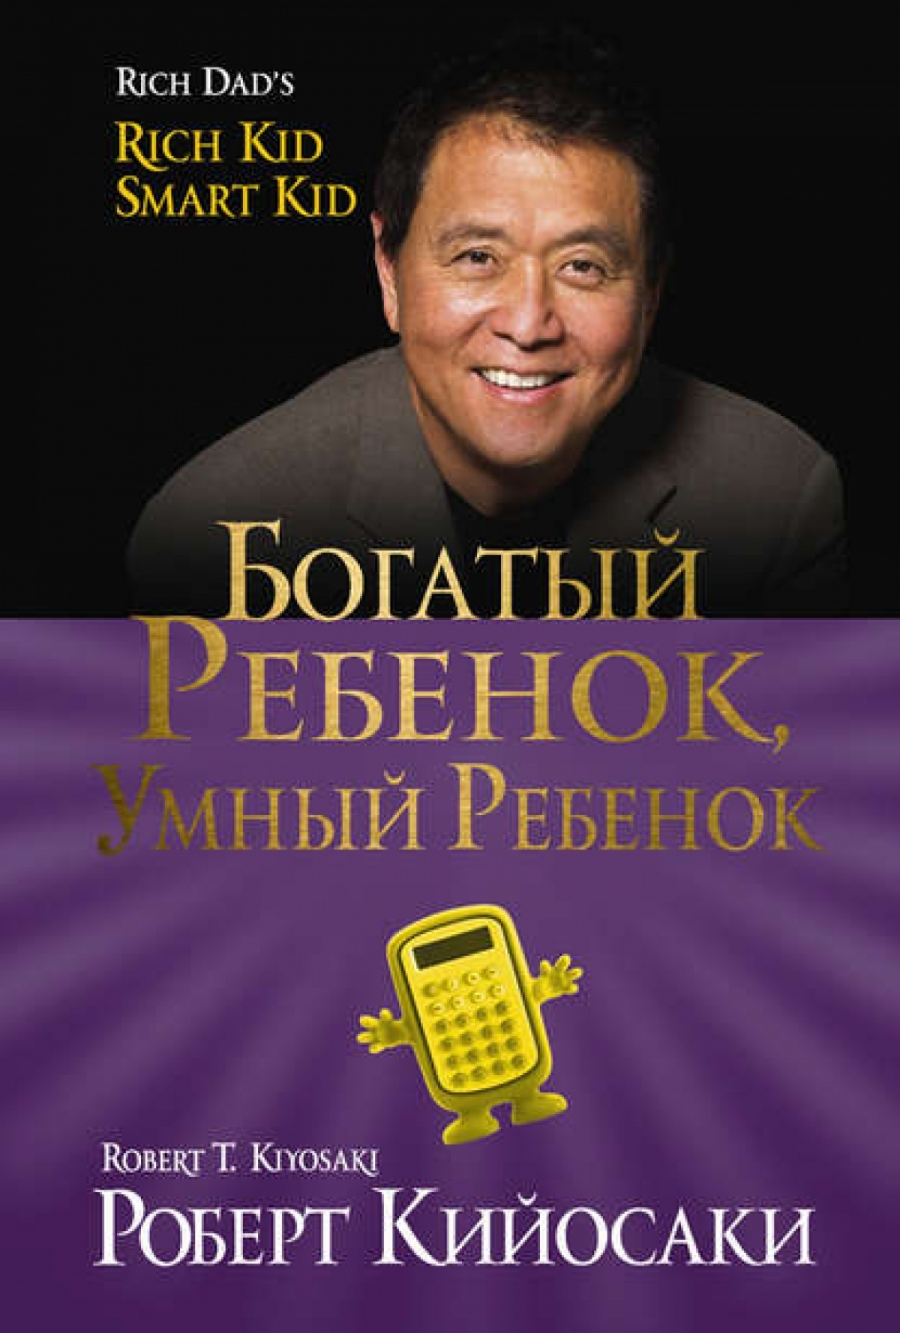 Шэрон Лектер, Роберт Кийосаки - Богатый ребёнок, умный ребёнок